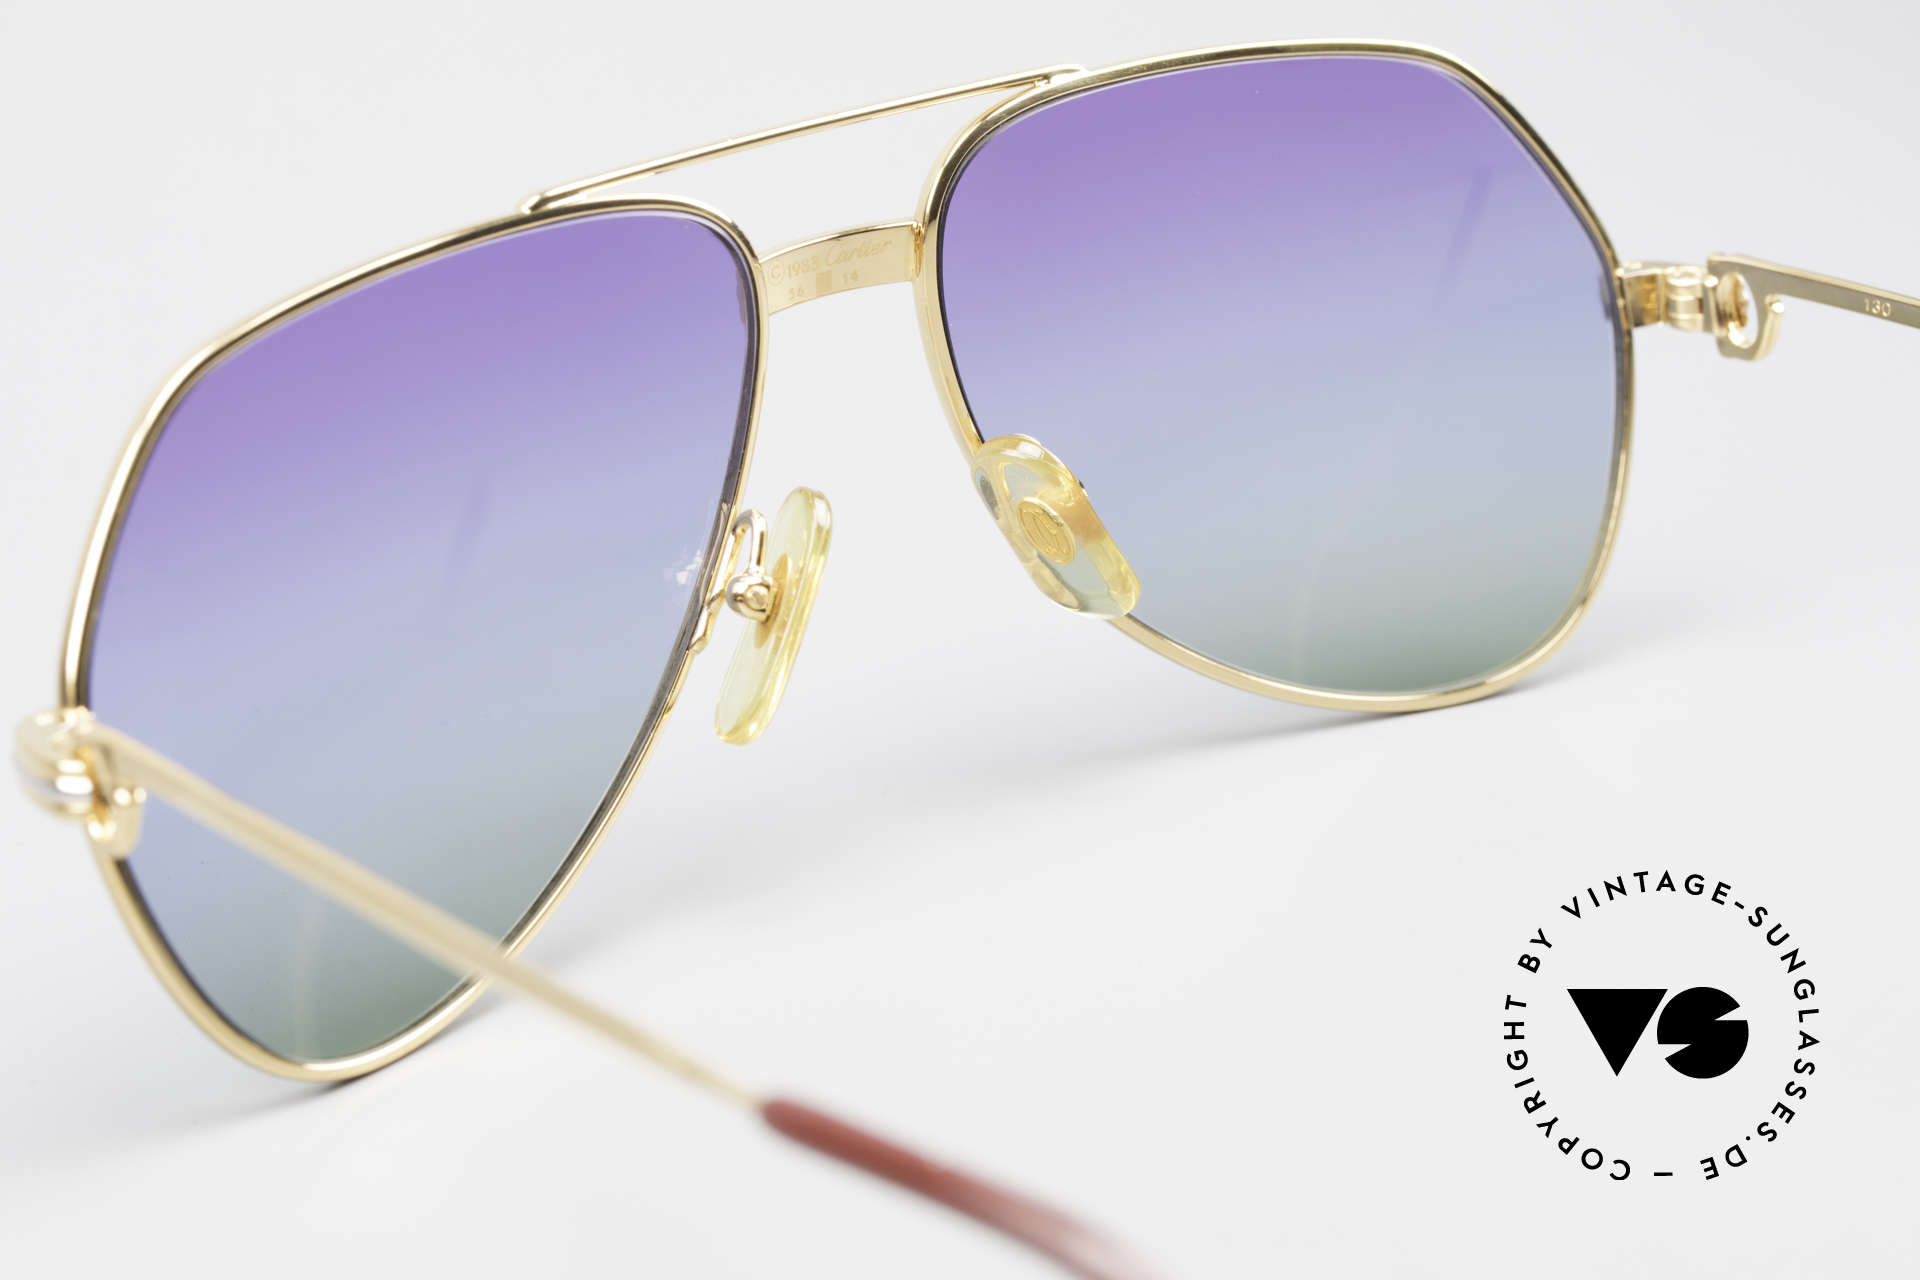 Cartier Vendome LC - S 80's Sunglasses Polar Lights, NO retro sunglasses, but an authentic vintage ORIGINAL, Made for Men and Women